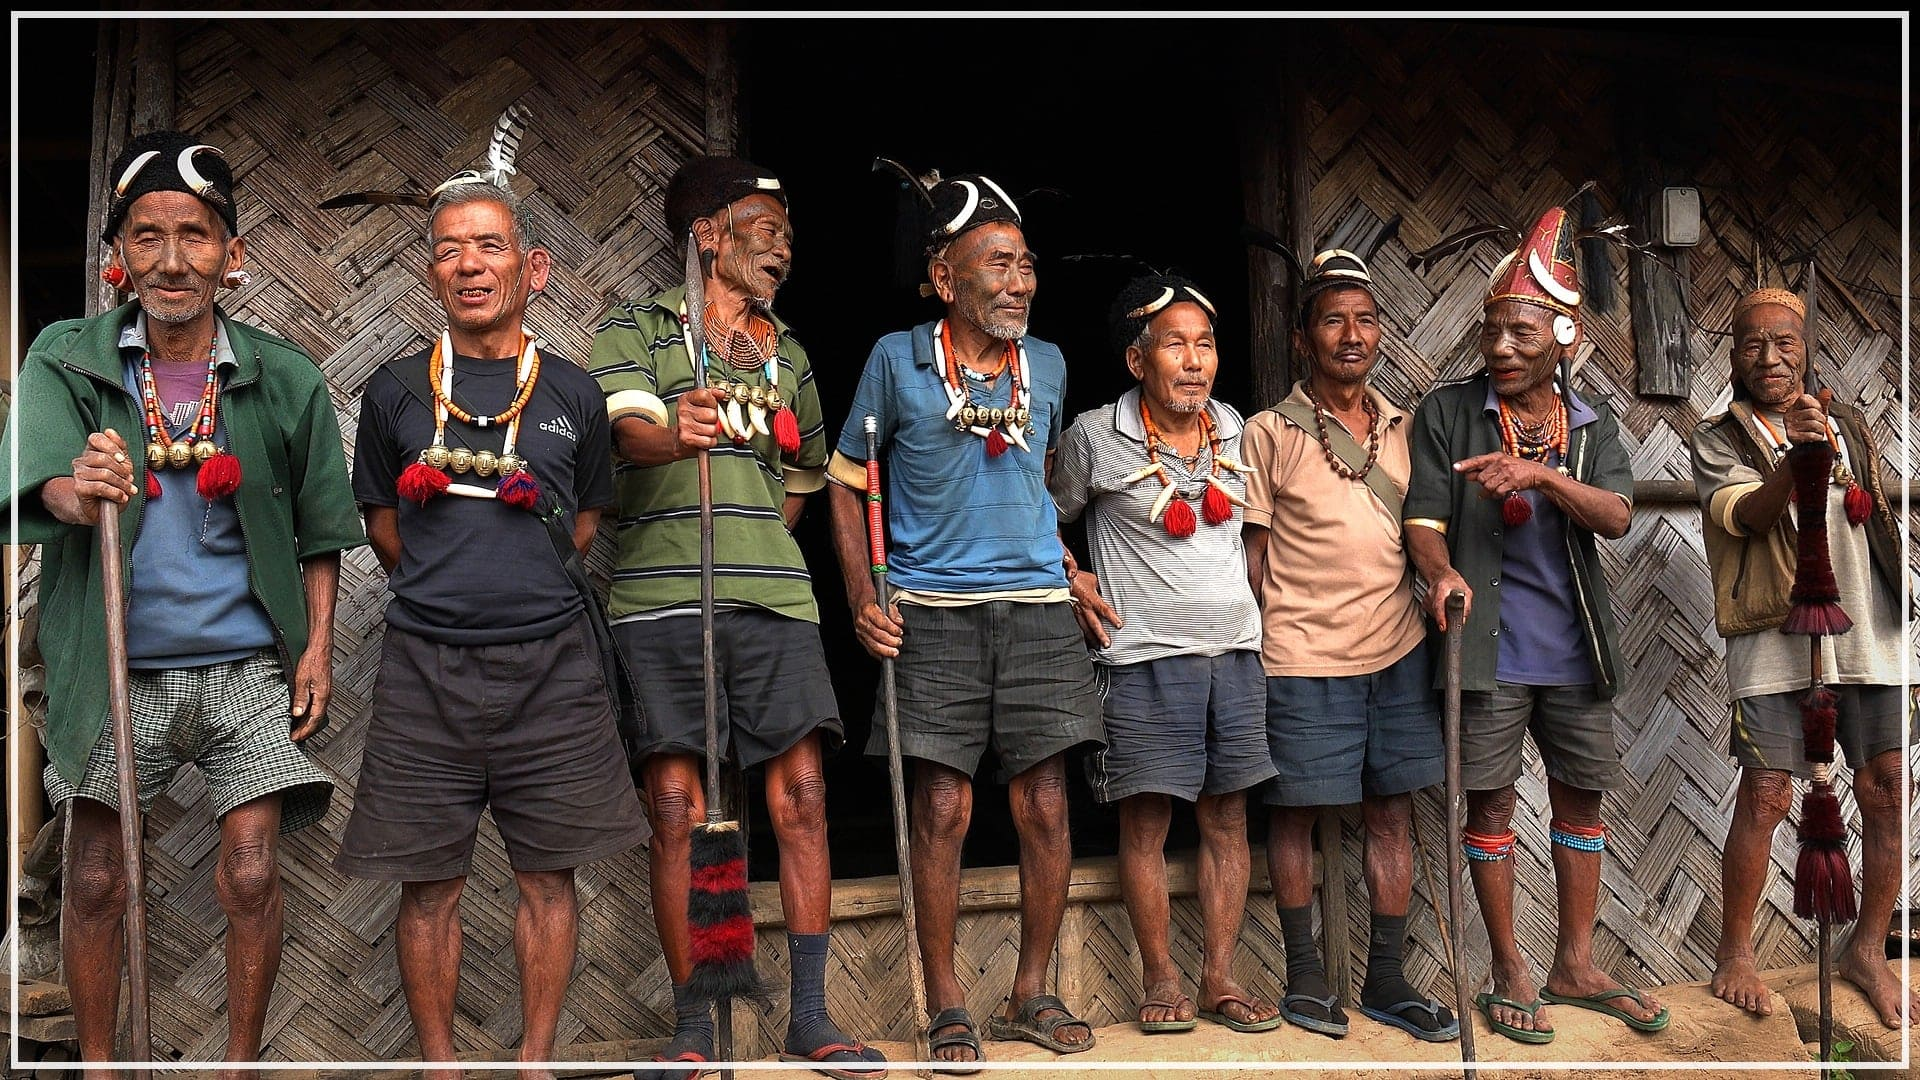 bei den (früheren) Kopfjägern im Nagaland